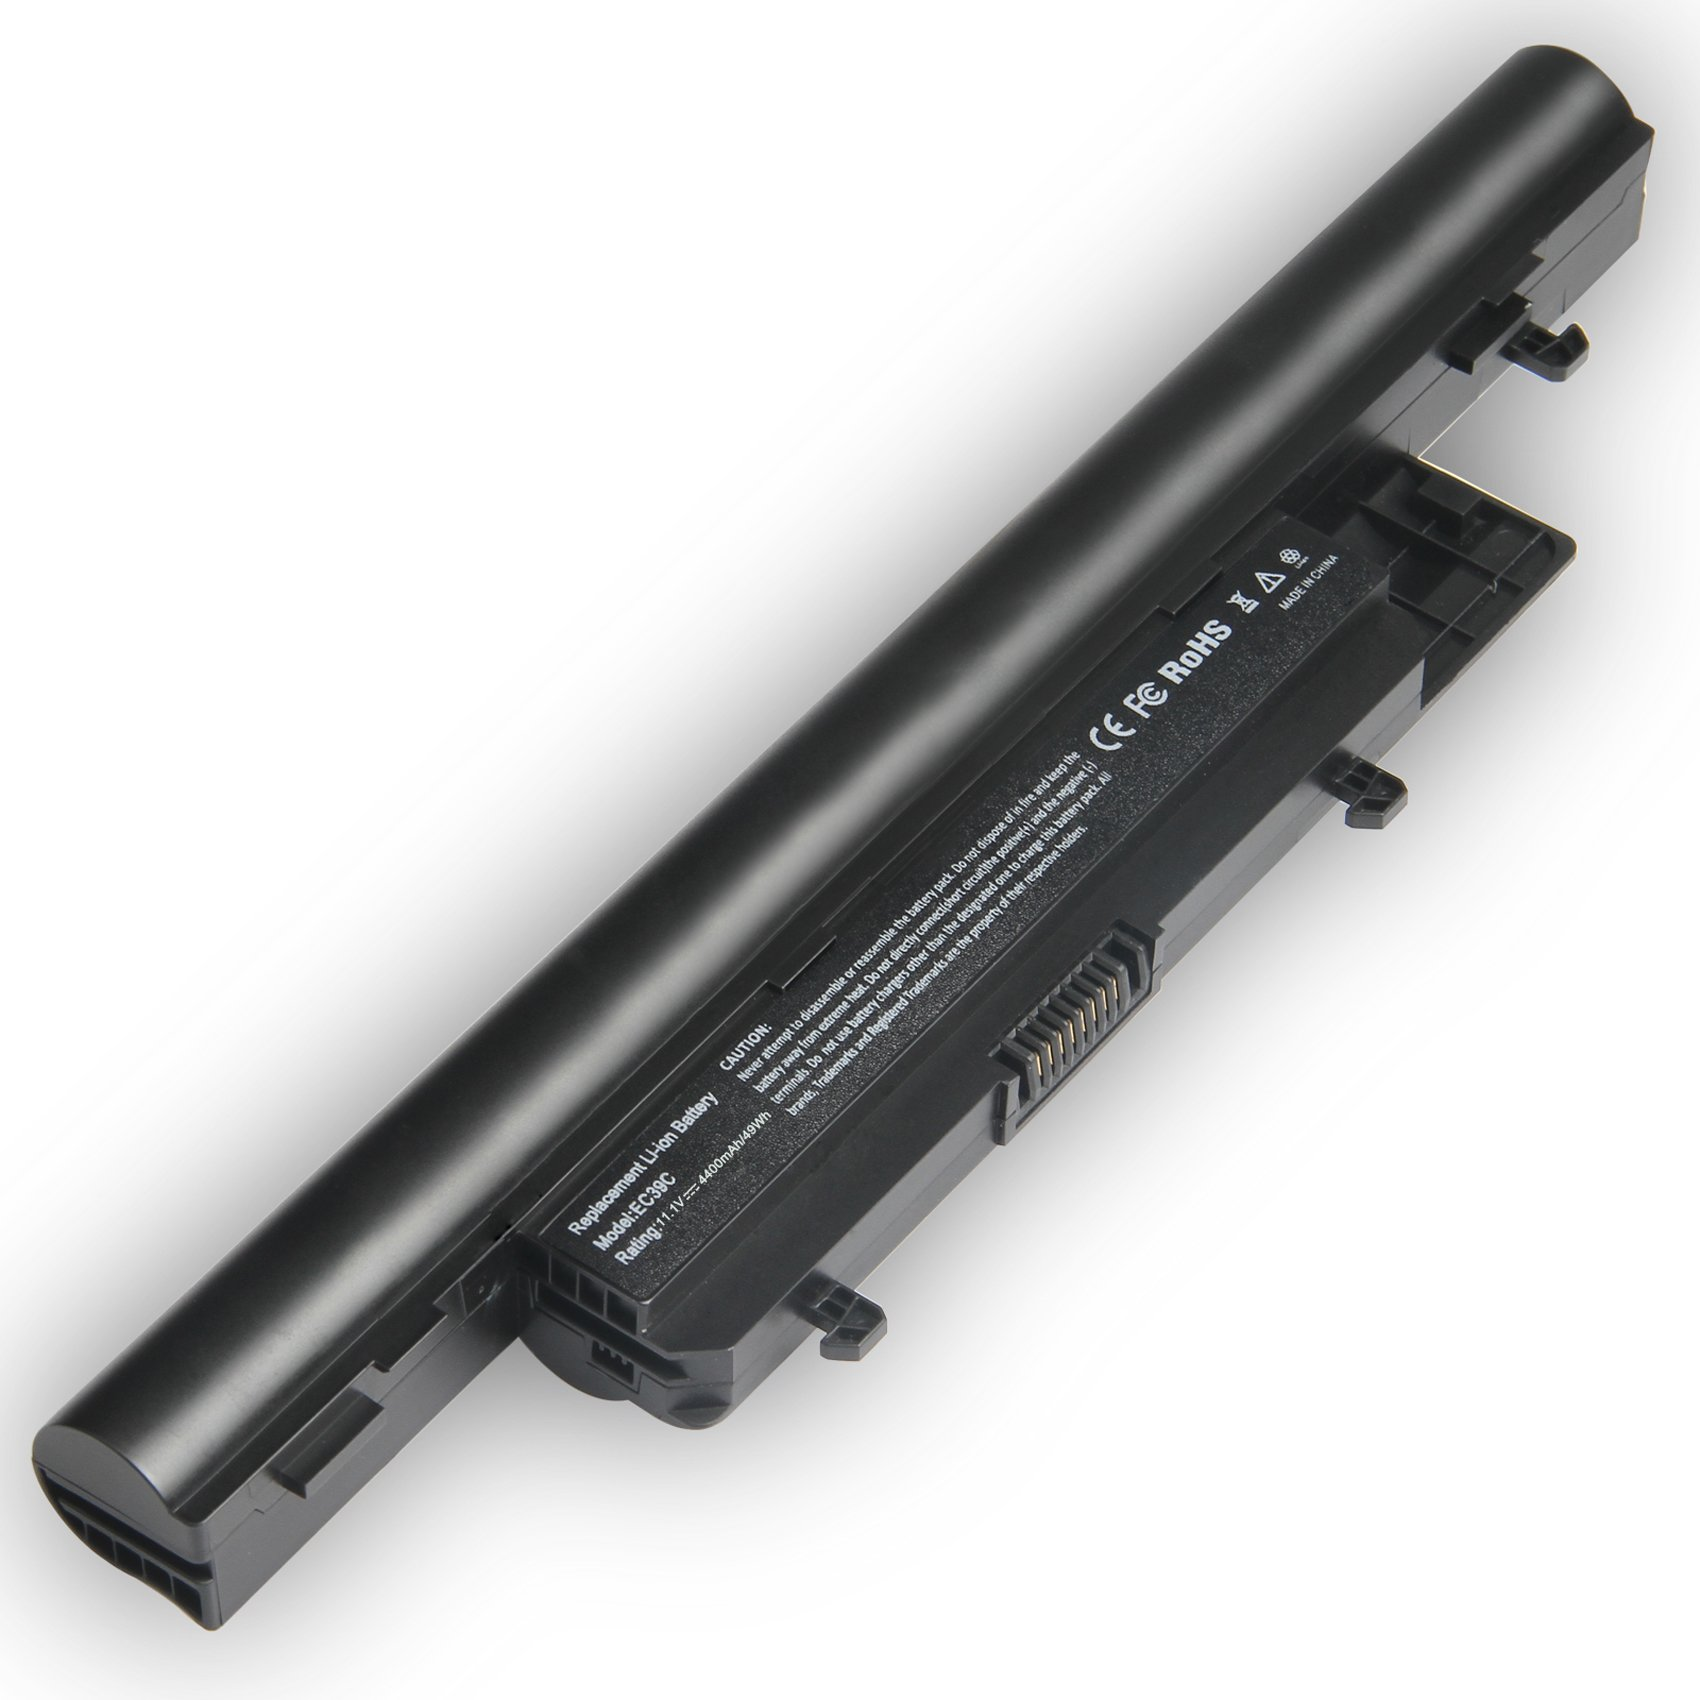 Bateria AS10H31 EC39C01c EC39C01w para Acer Gateway para AS10H7E AS10H75 AS10H51 AS10H3E AS10H31 AL10F31 AL10E31 3ICR17/